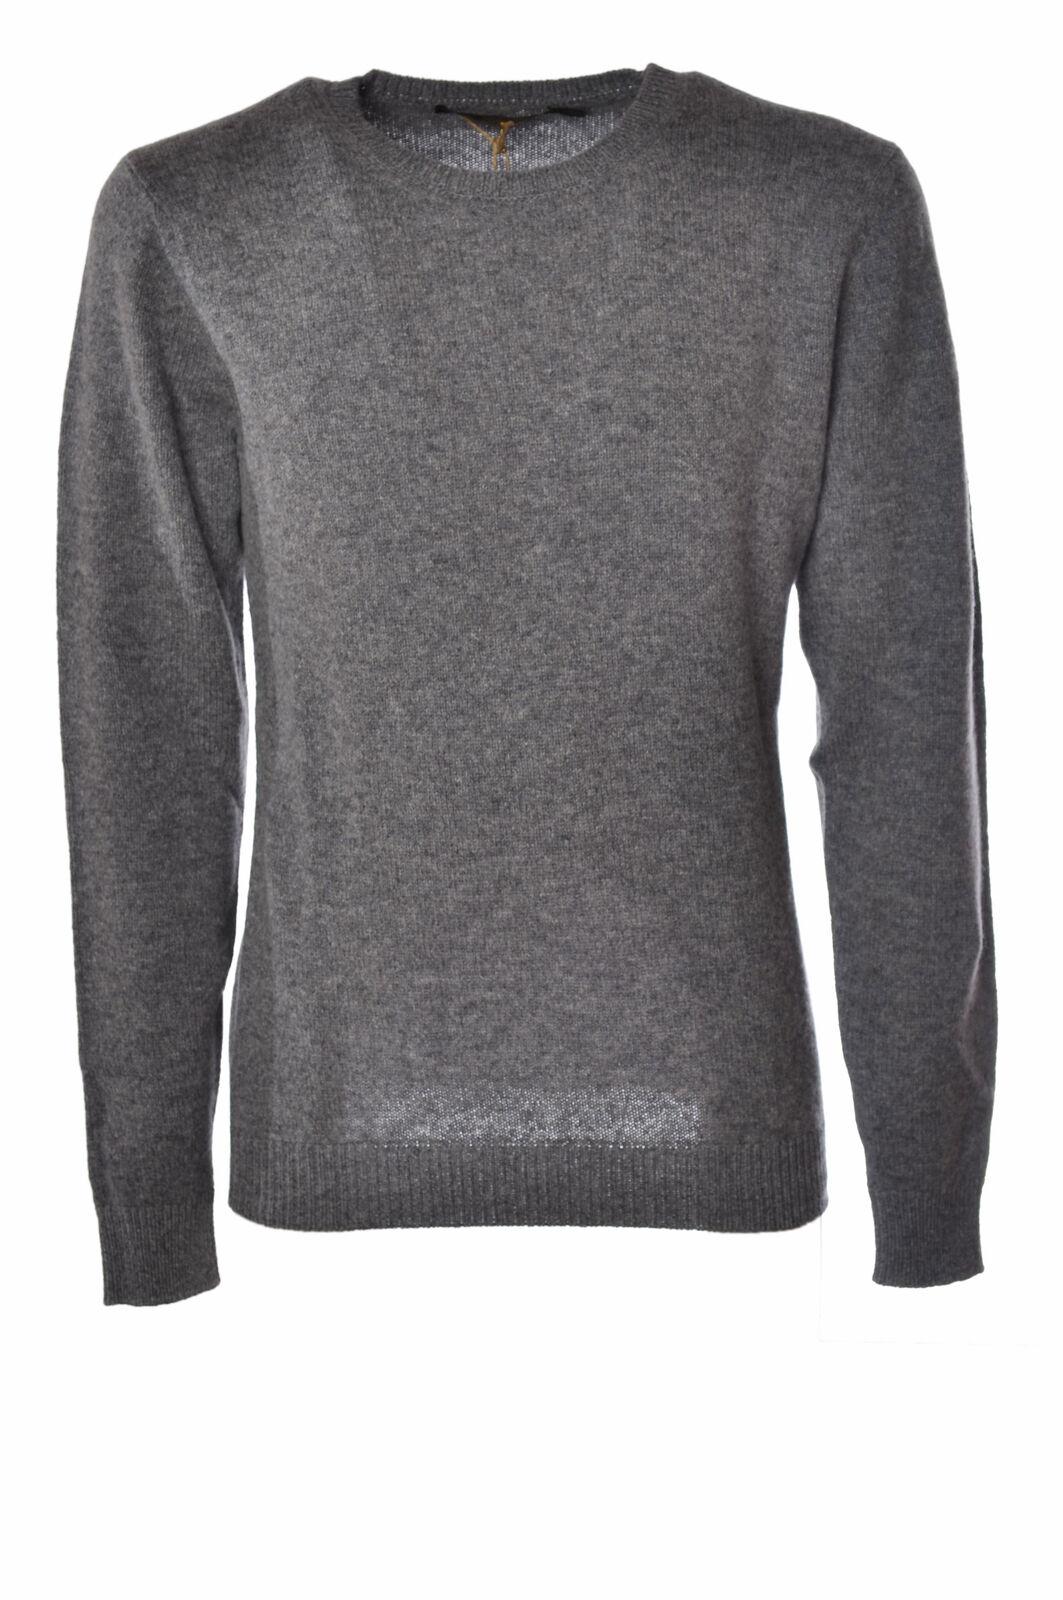 Irish Crone  -  schweißers - Male - grau - 2509626N173455